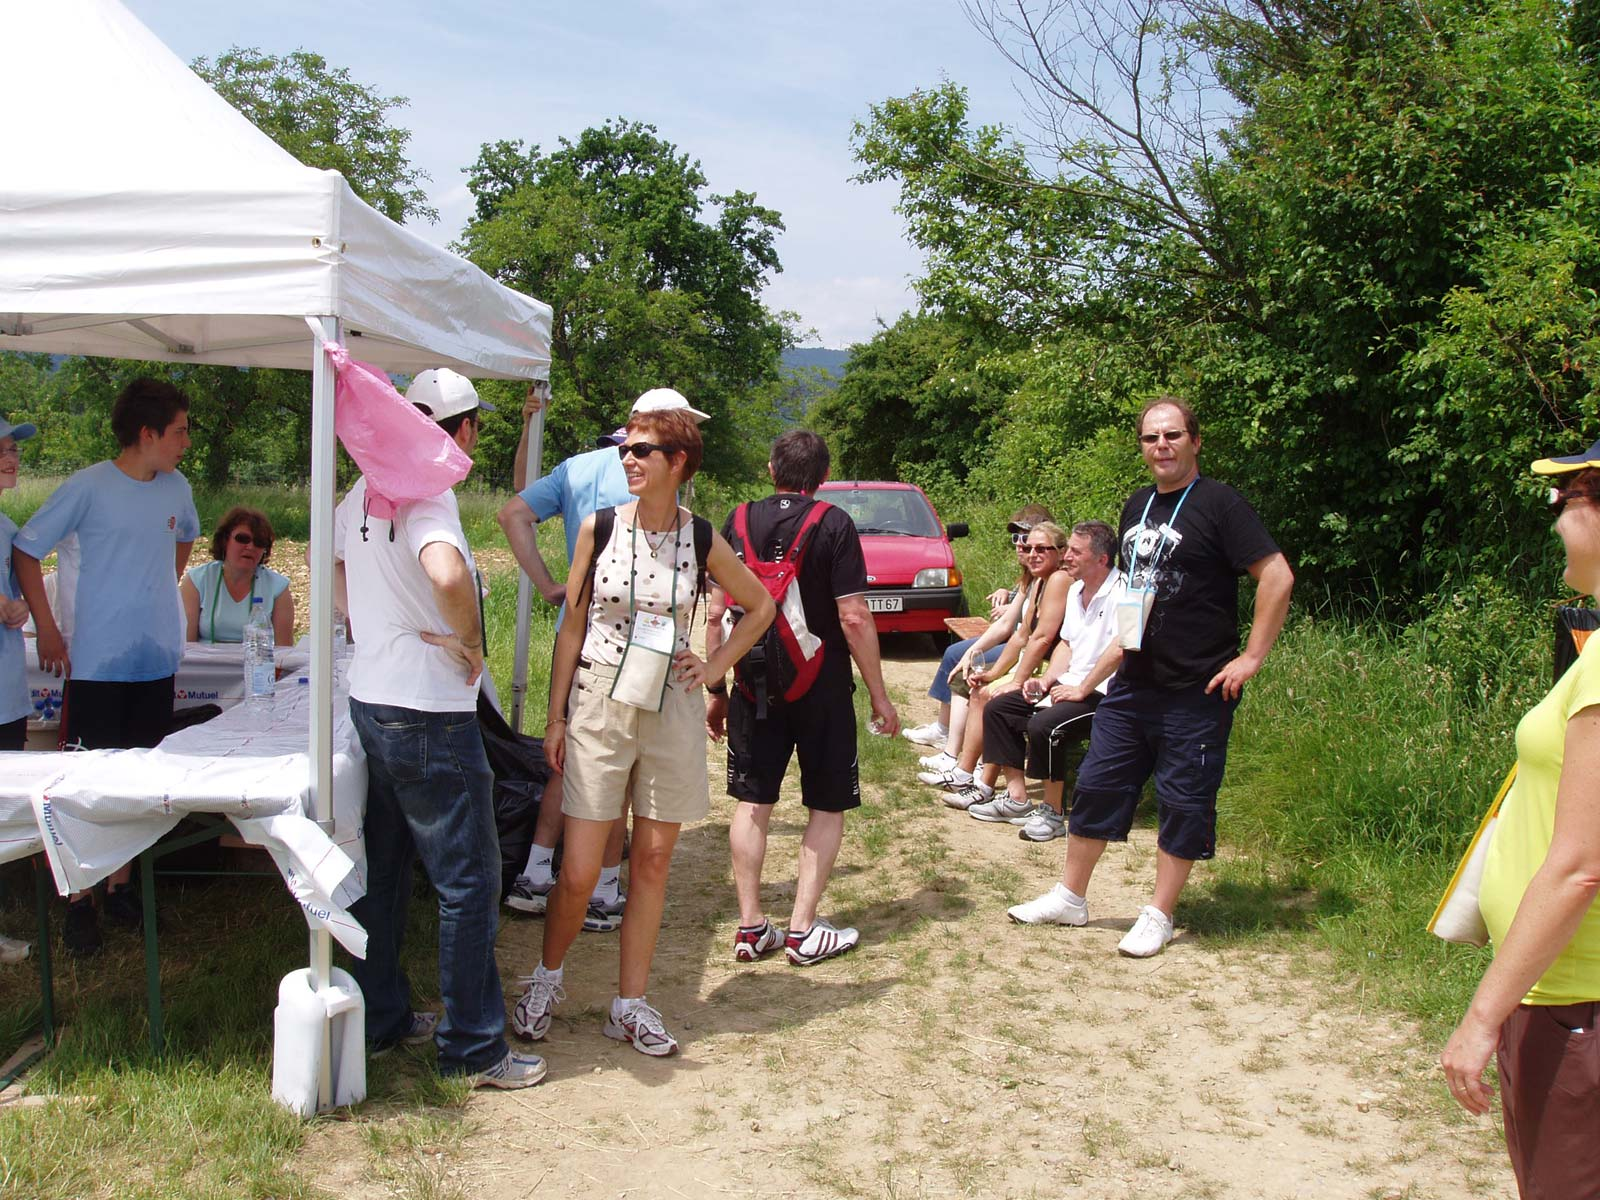 https://apps.tourisme-alsace.info/photos/niederbronn/photos/Marche-gourmande.jpg